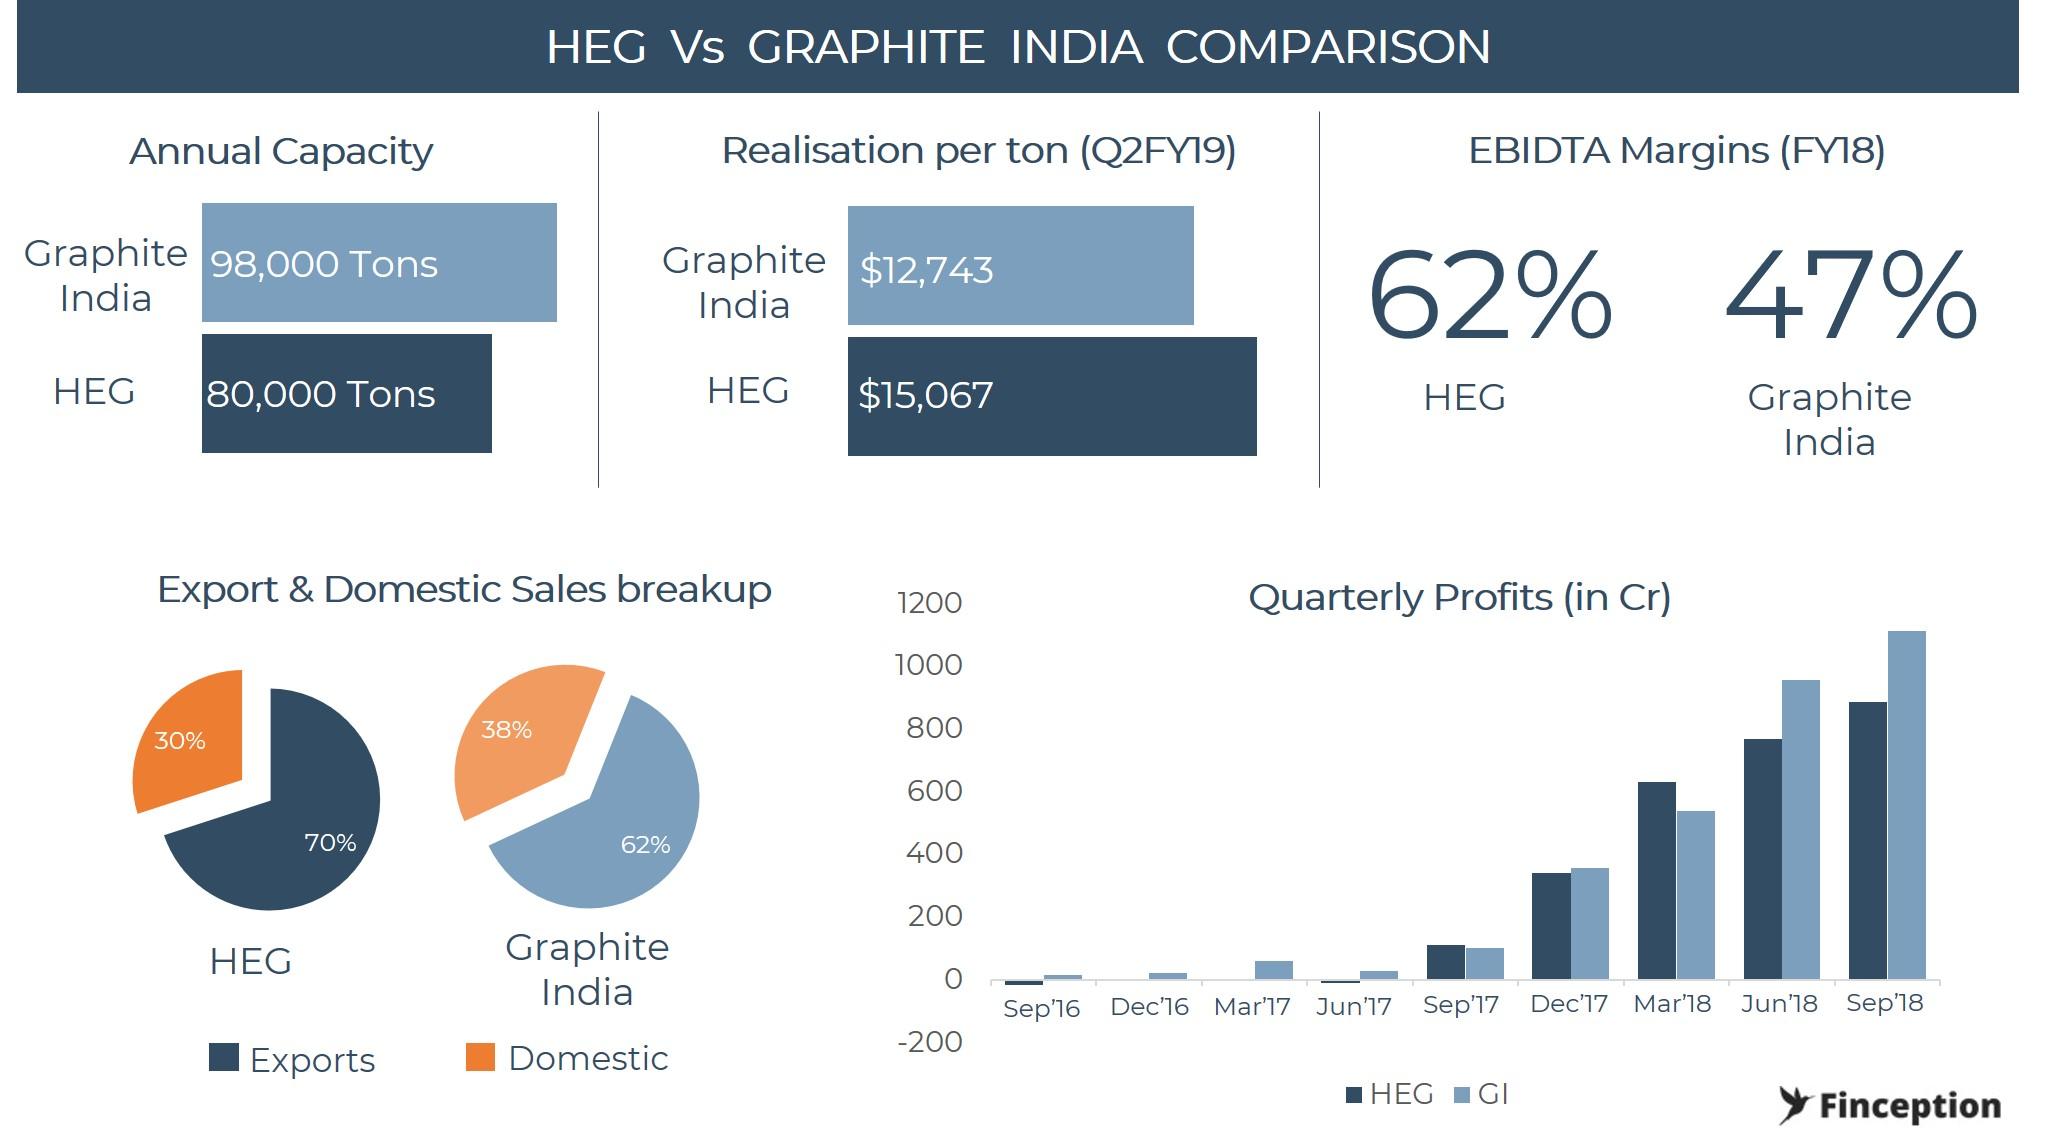 Comparison of HEG and Graphite India